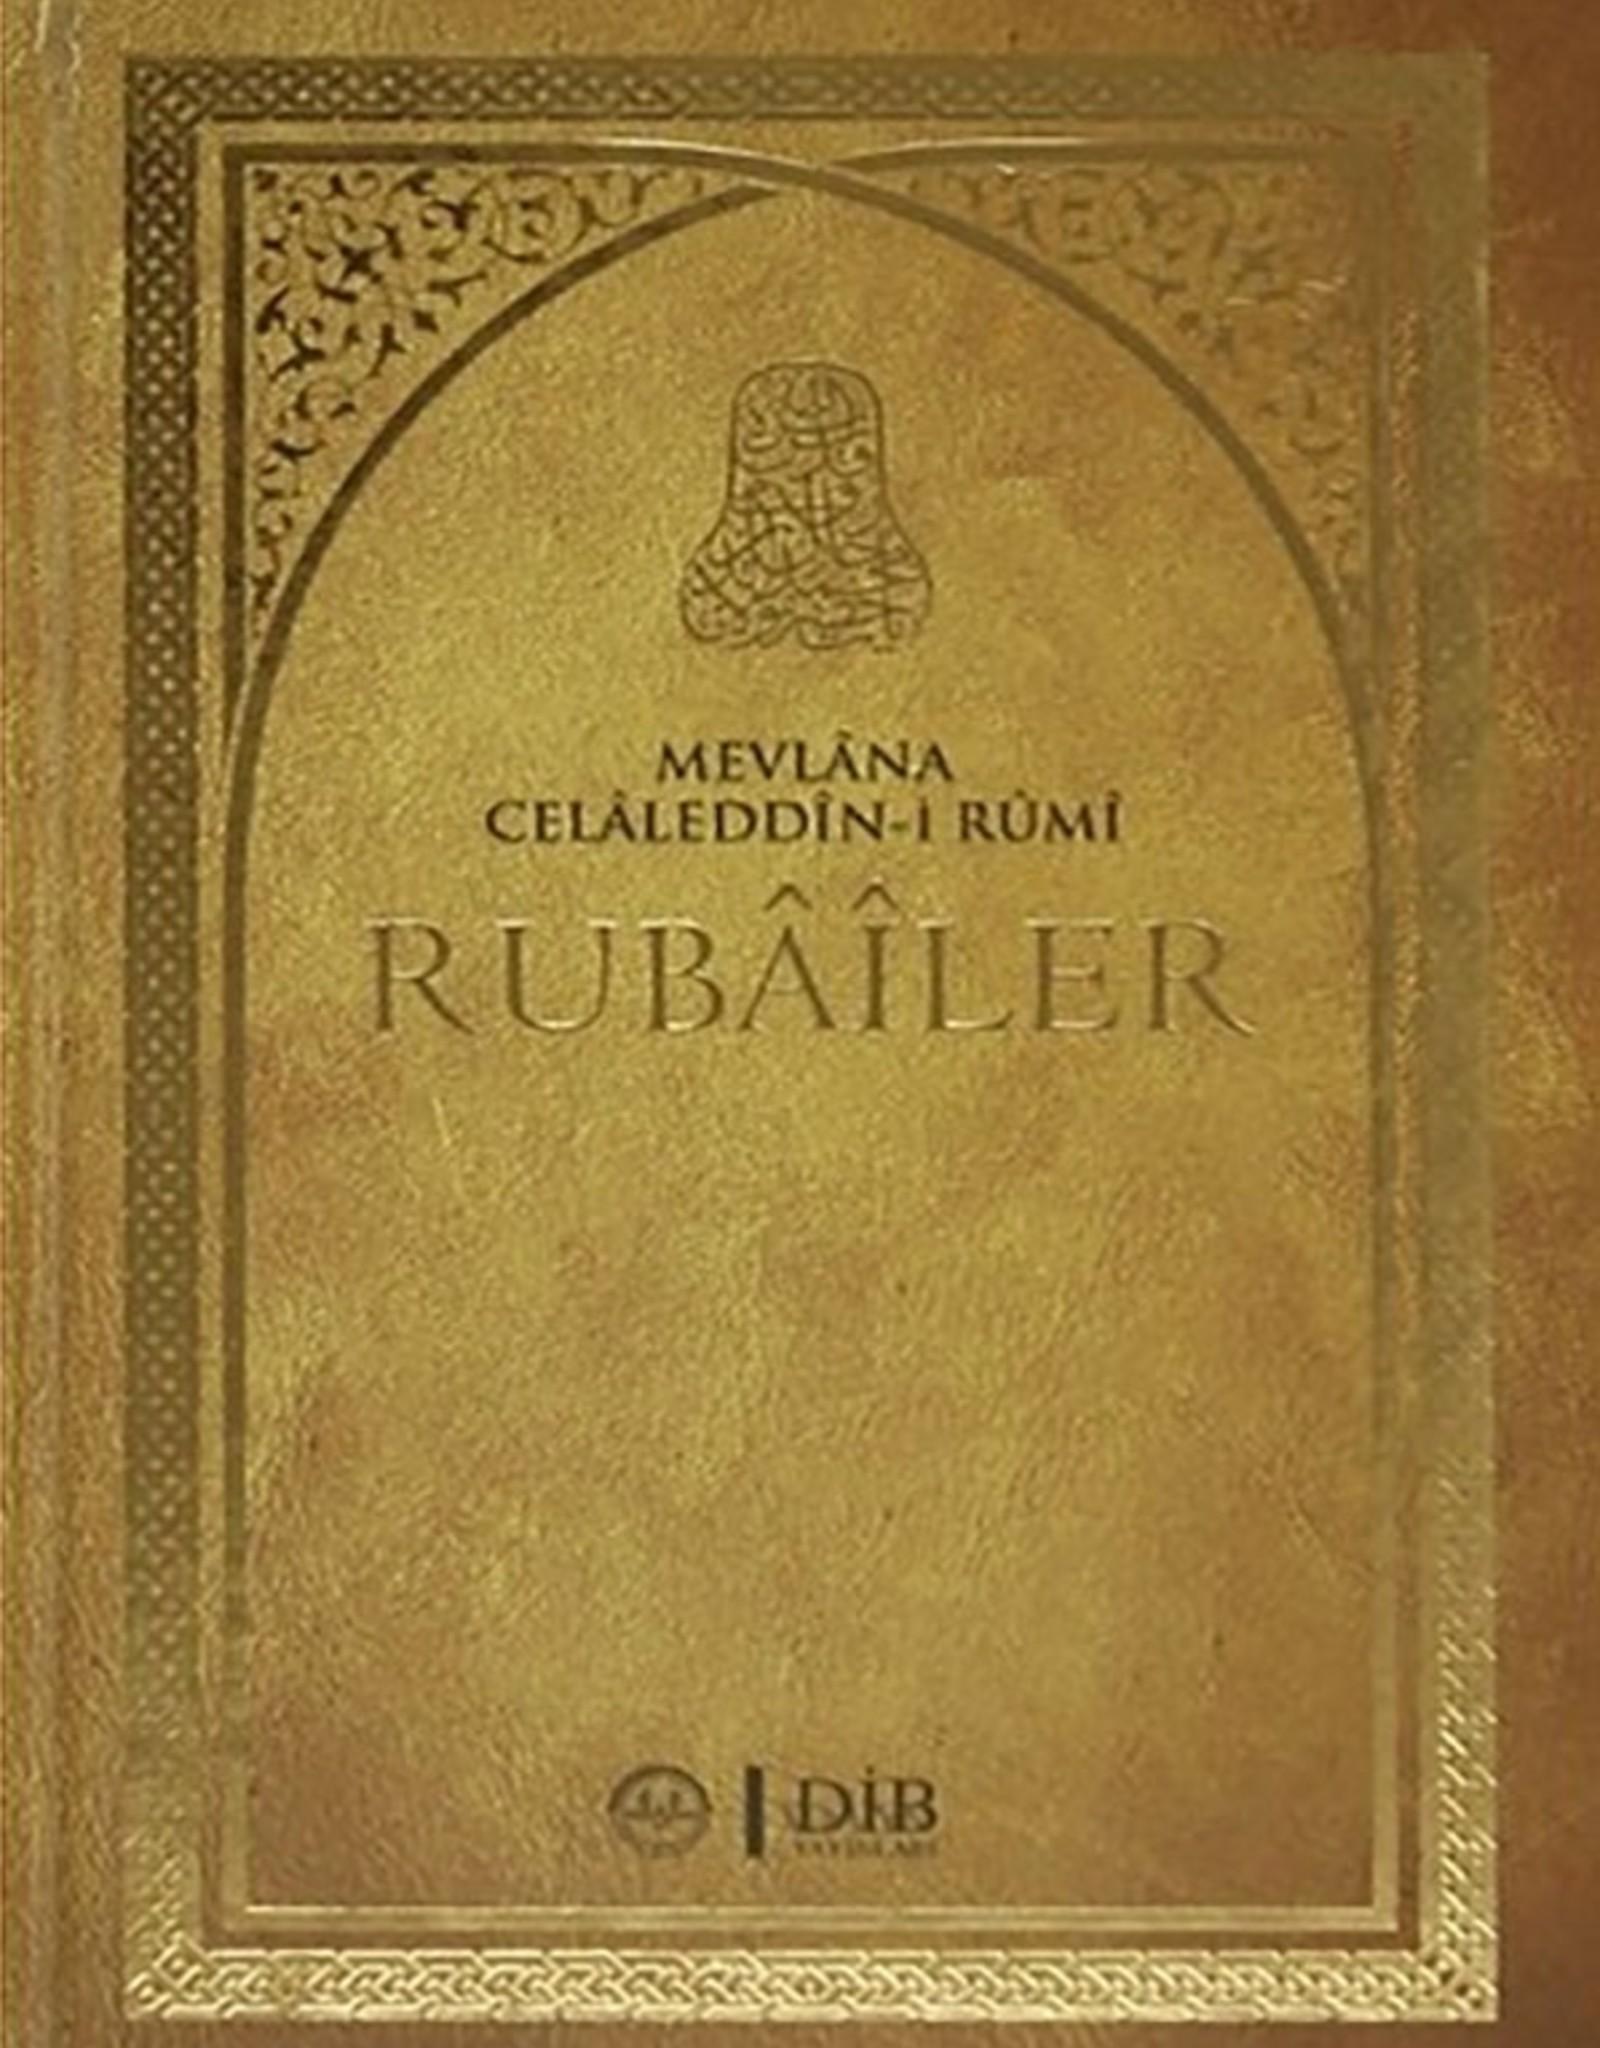 Mevlana Celaleddin-i Rumi Rubailer